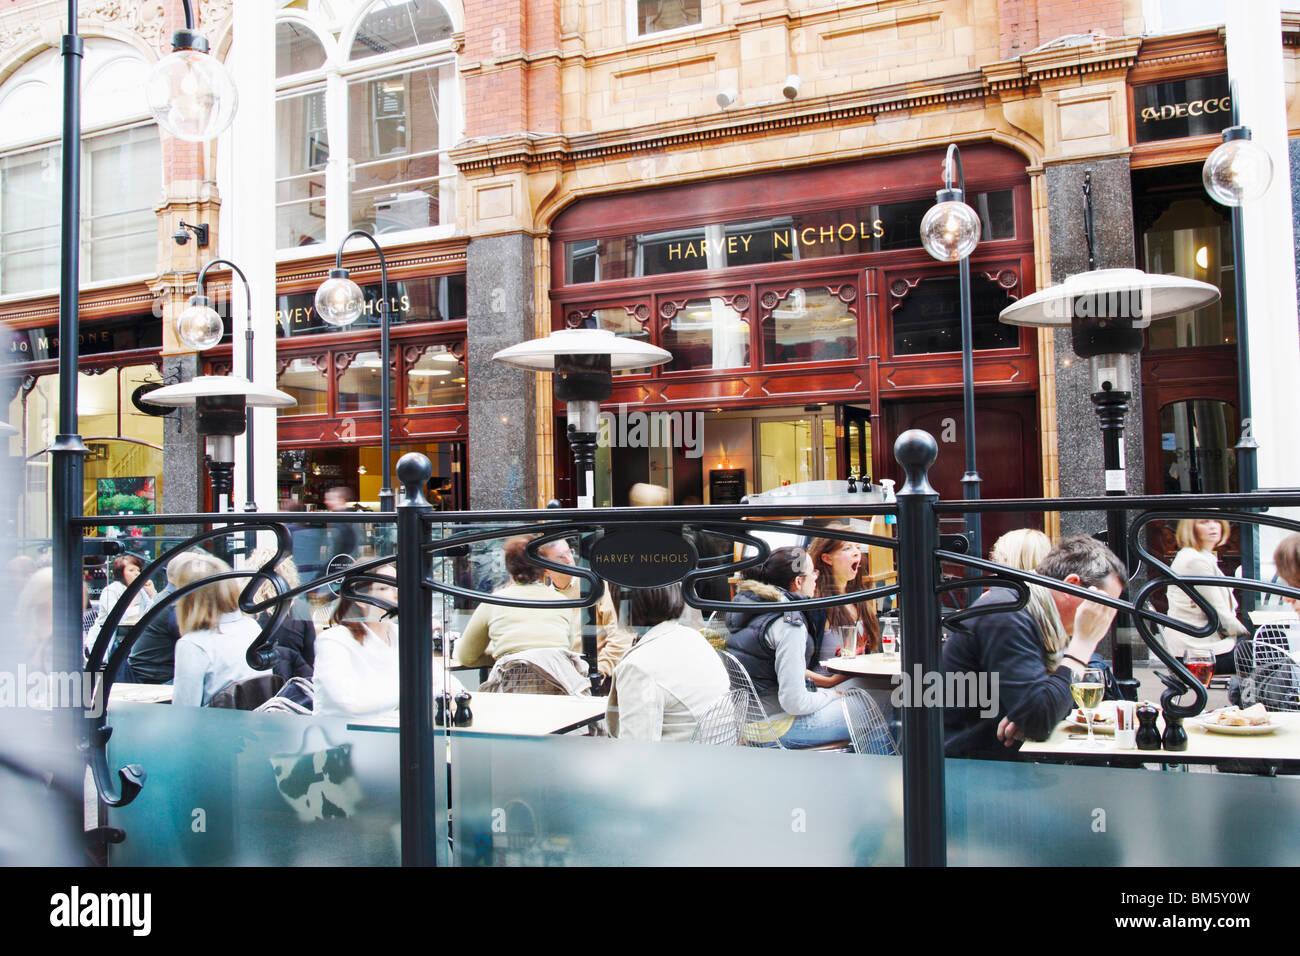 Harvey Nichols cafe outside Harvey Nichols store in the Victoria Quarter, Briggate, Leeds, Yorkshire, England. UK - Stock Image